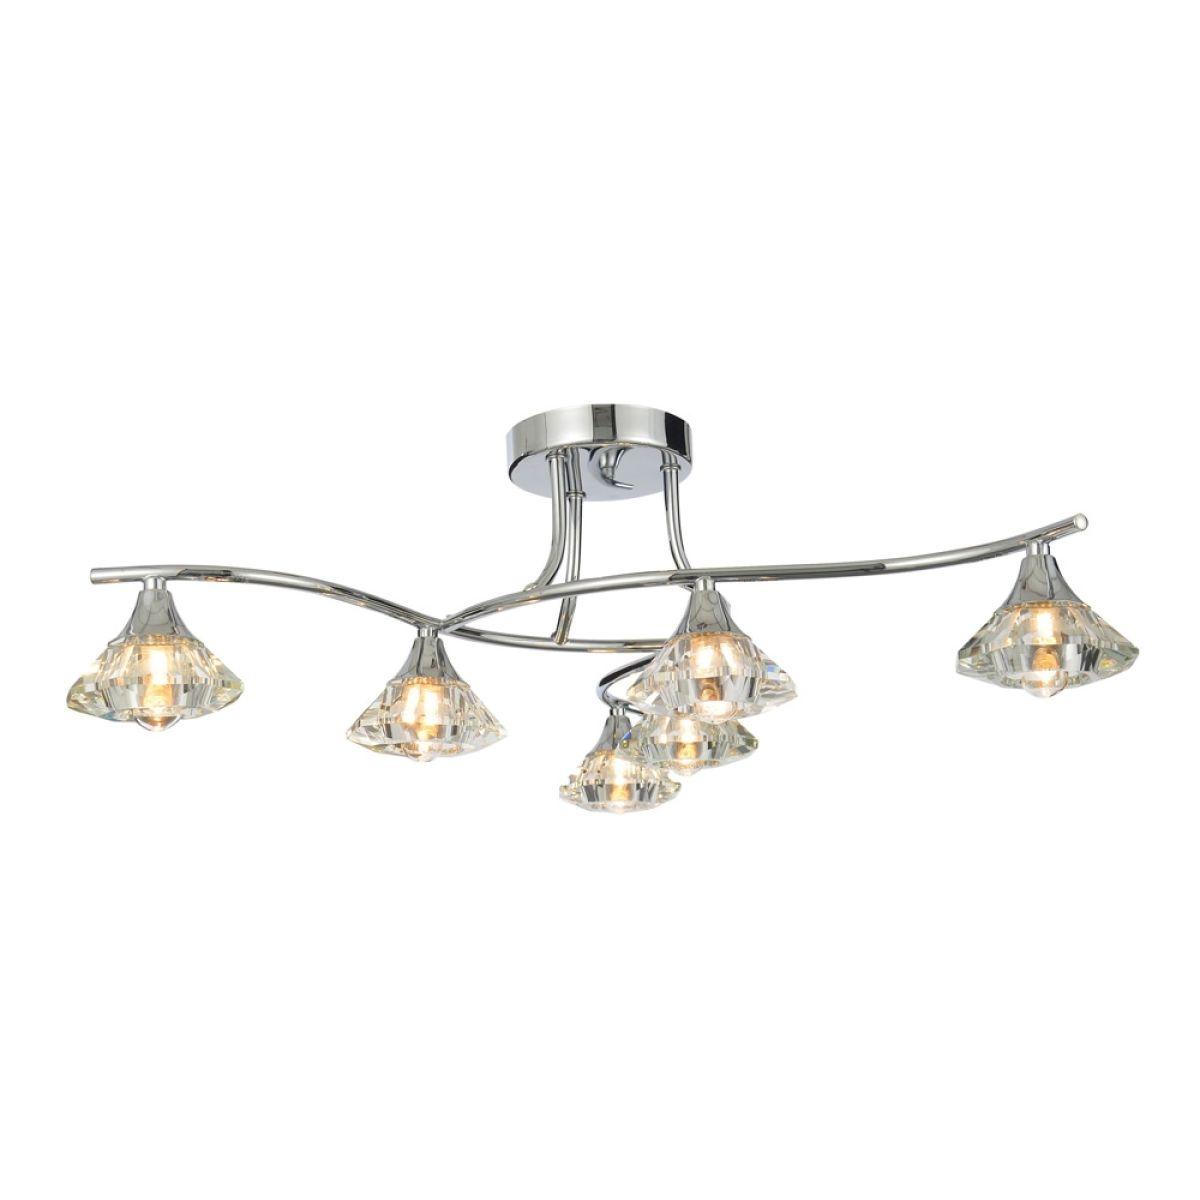 Forum Reena 6 Light Ceiling Lamp